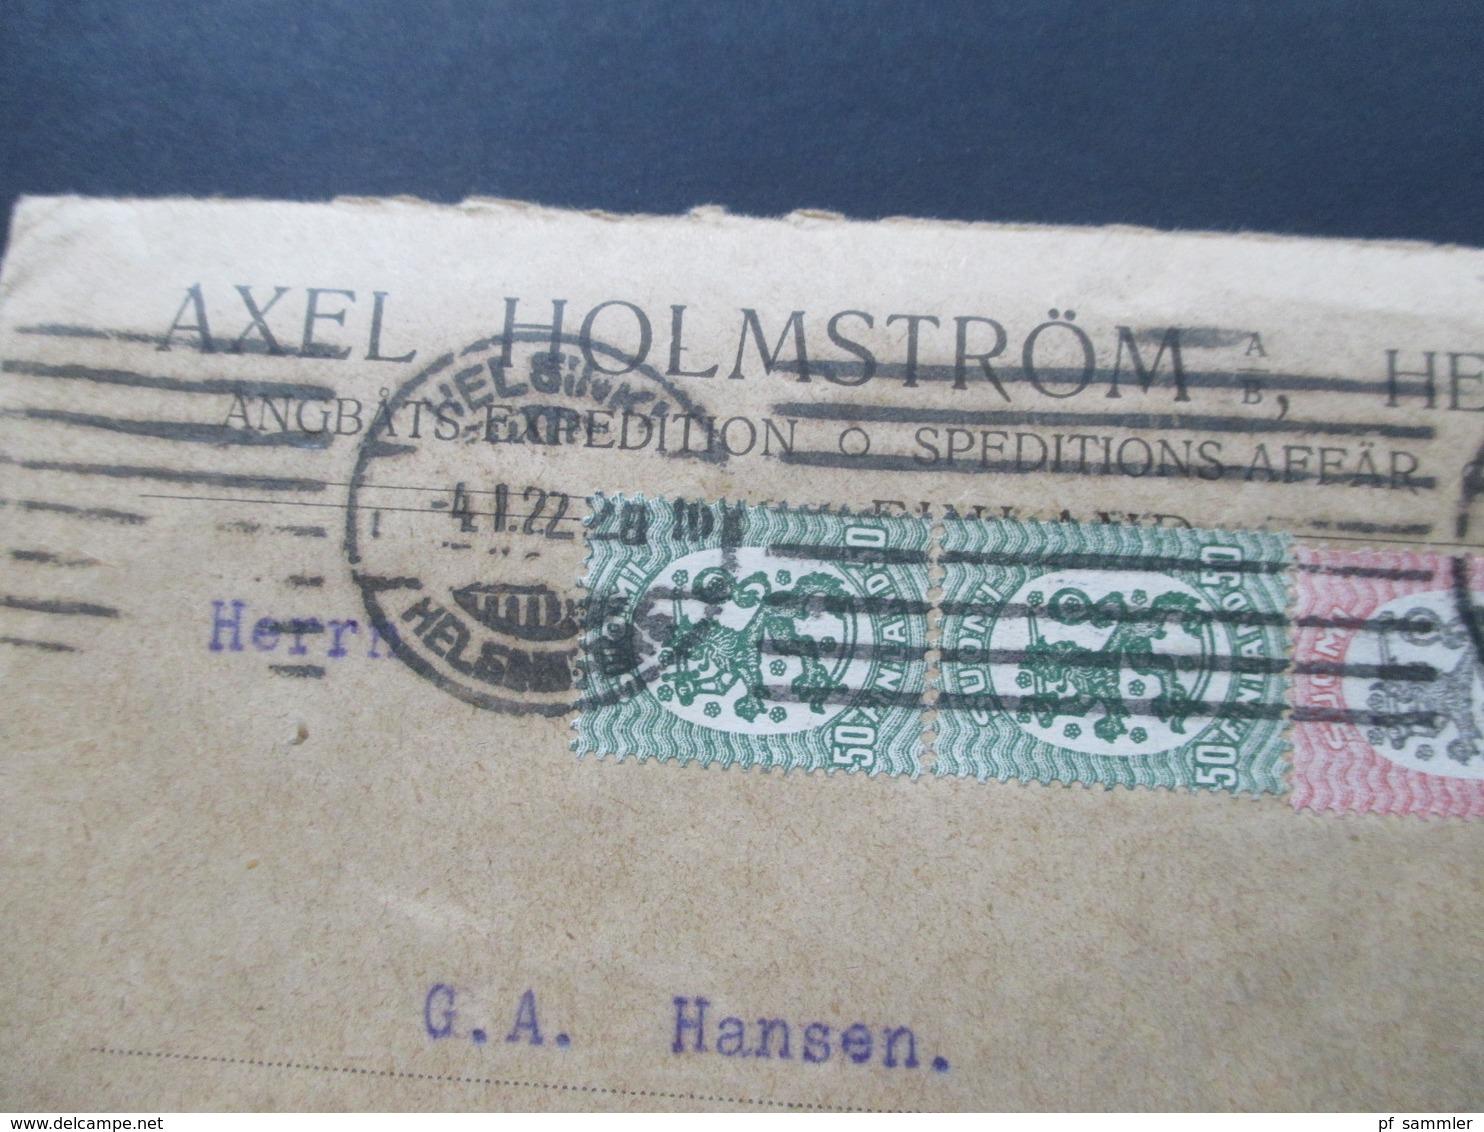 Finnland 1922 MiF Nr. 83 / 86 Freimarken Wappen Axel Holmström Helsingfors. Speditions Affär - Finland